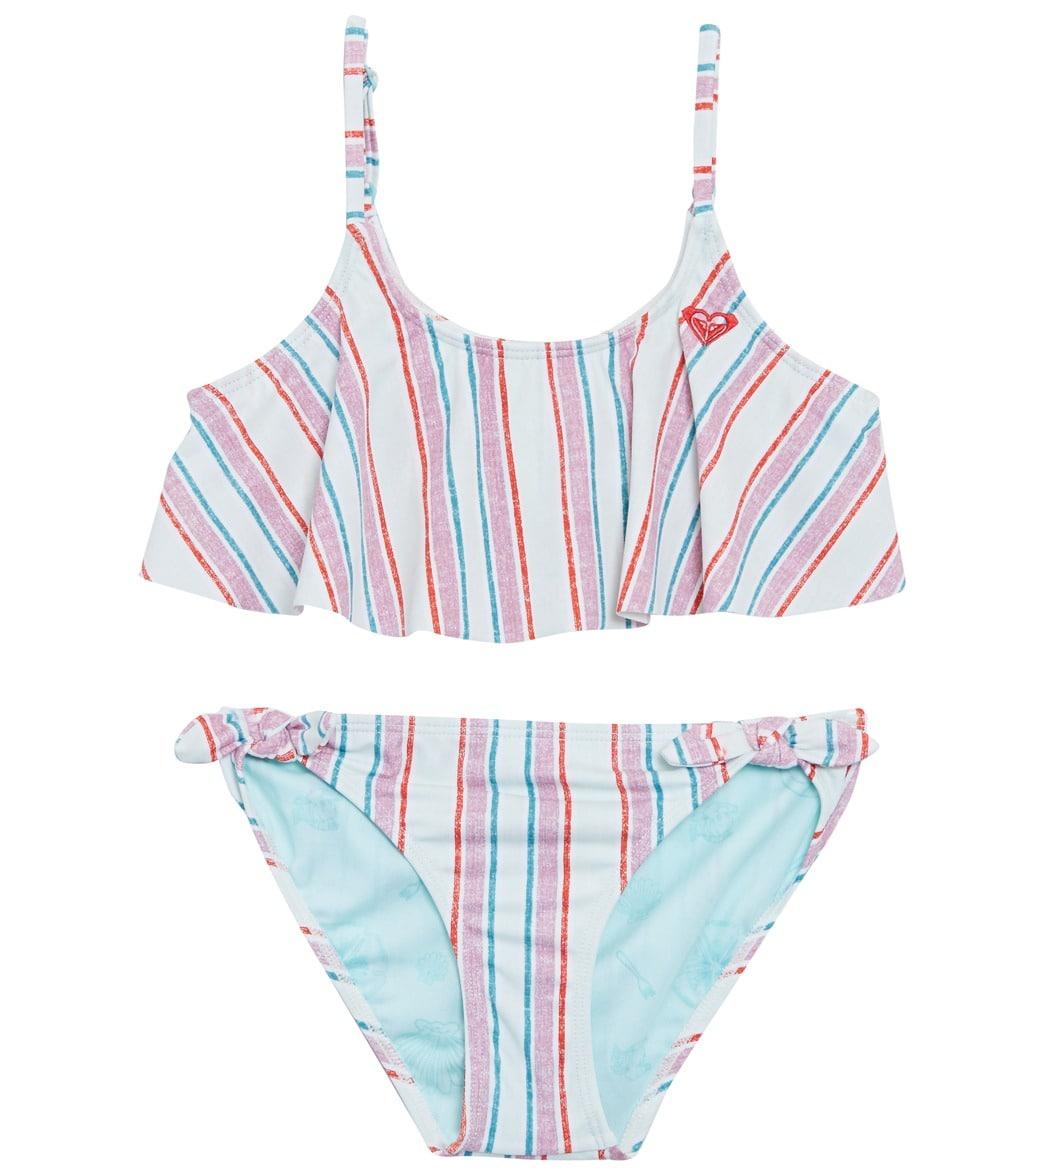 5bf3d0af12 Disney x Roxy Girls' Treasure Flutter Bikini Set (Little Kid, Big Kid) at  SwimOutlet.com - Free Shipping